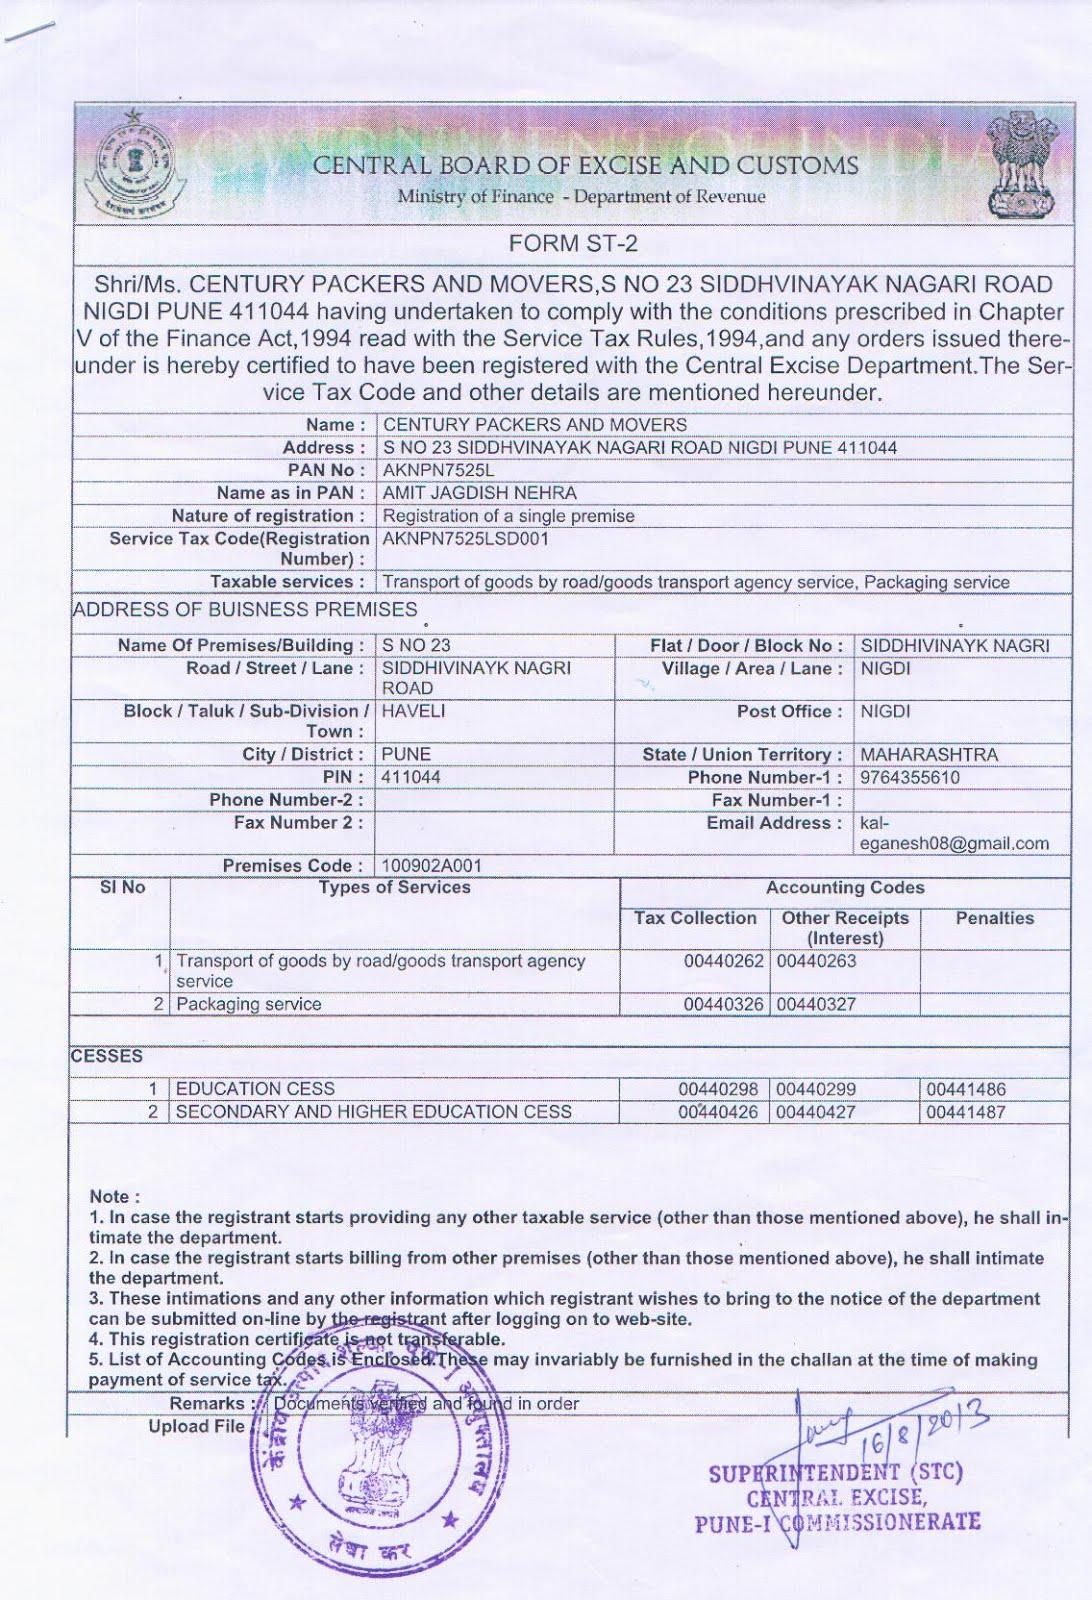 Service Tax Certifiate Page-1